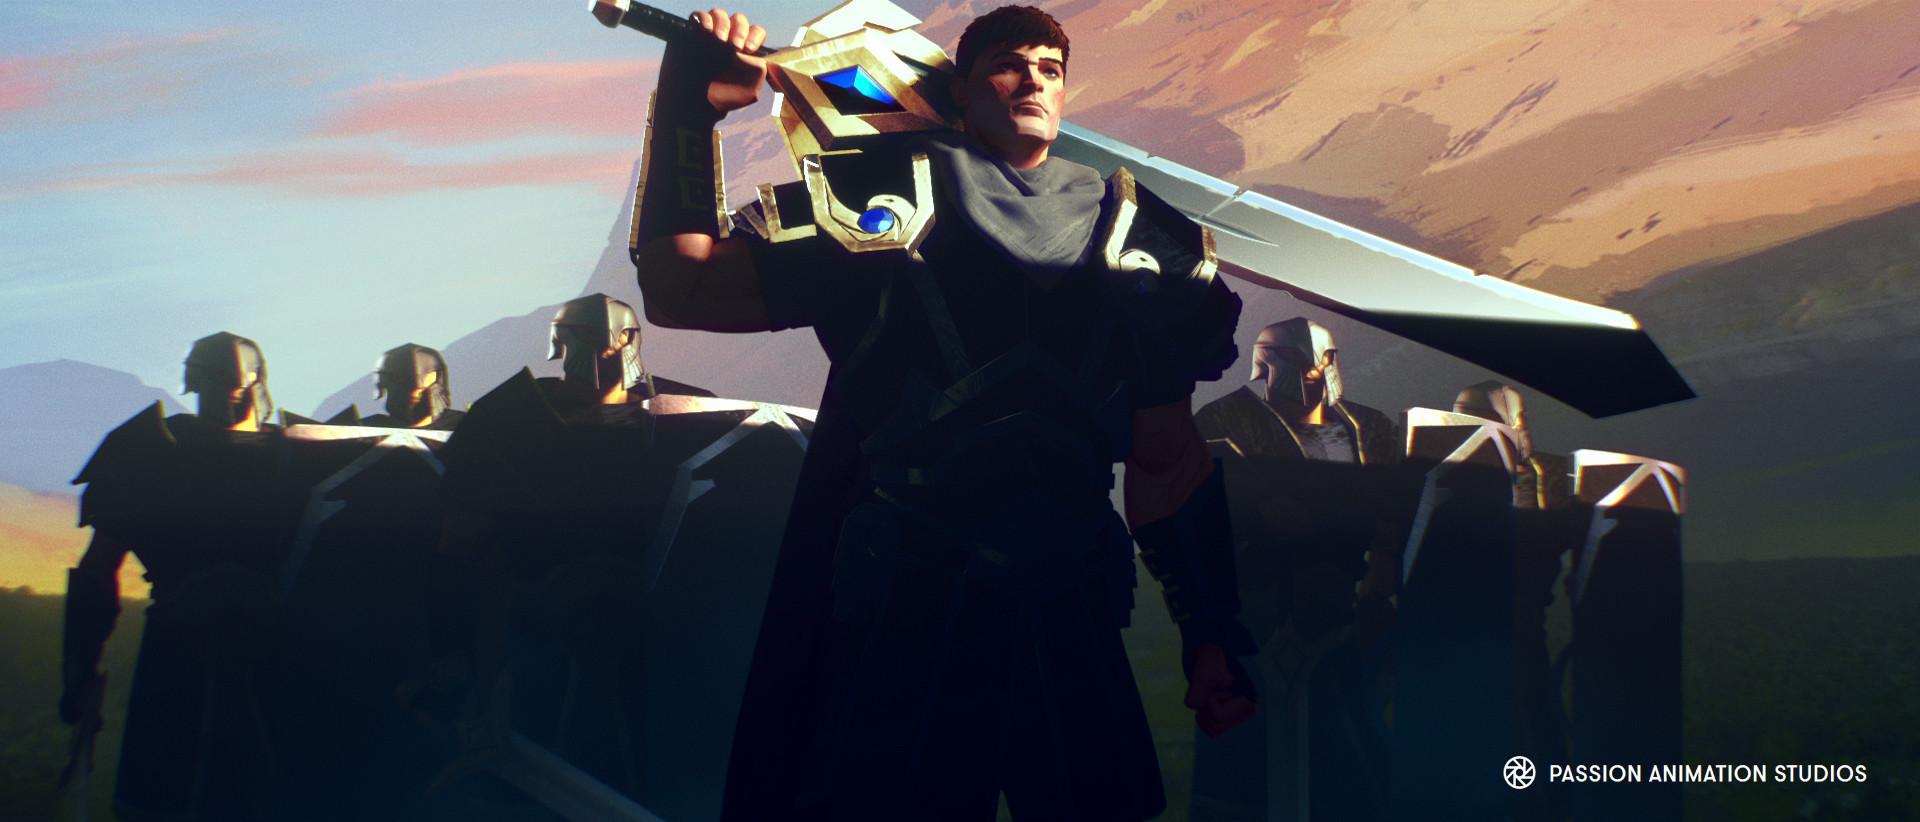 Legends Never Die宣传动画,英雄联盟S7主题曲,英雄联盟高清壁纸,